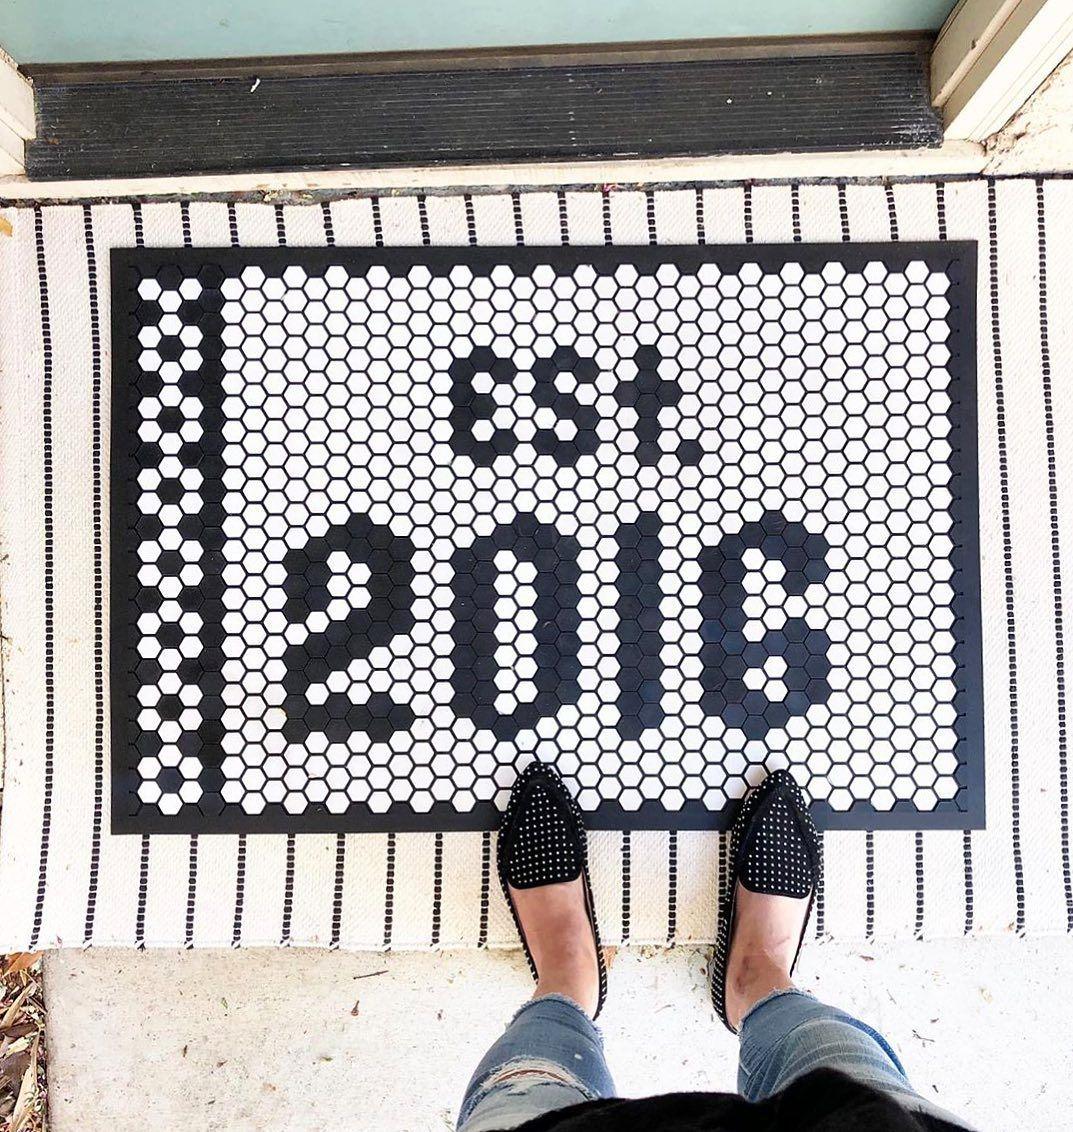 hexagon pattern black and white tiles